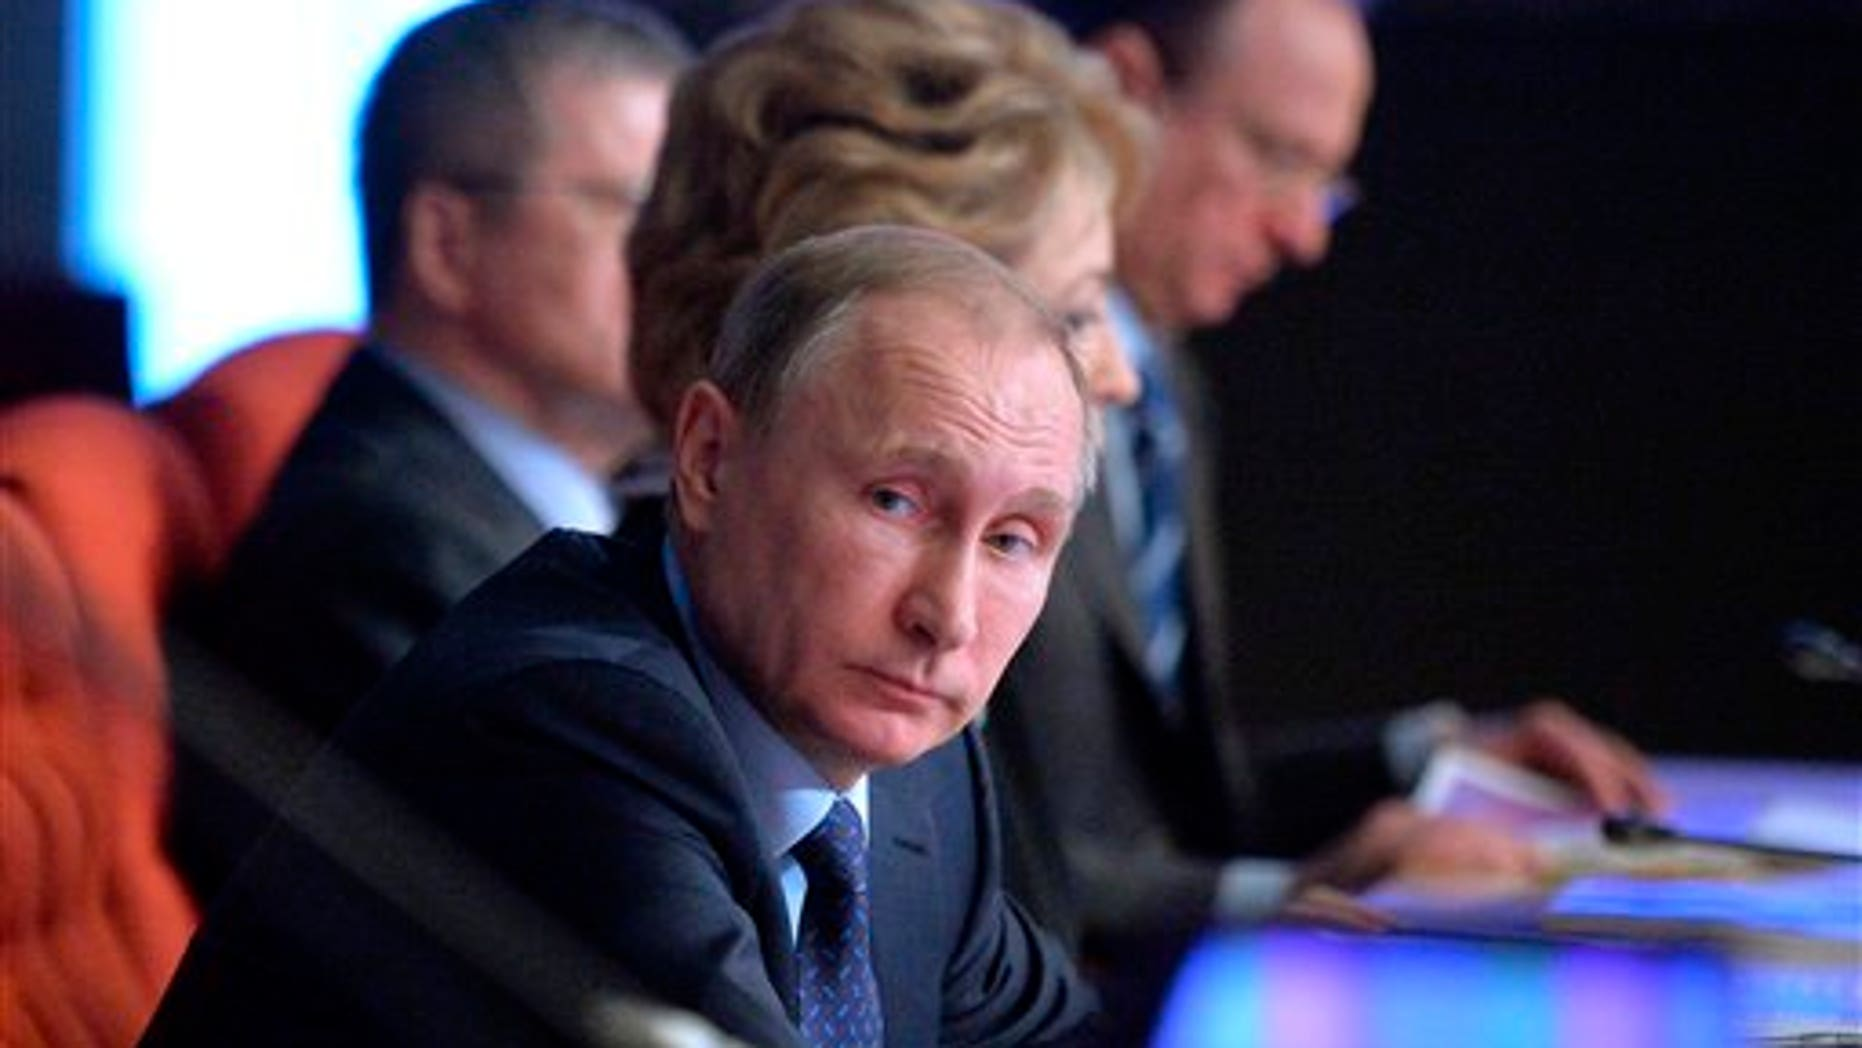 Russian President Vladimir Putin, foreground, listens during a meeting of Russian judges in Moscow, Russia, Tuesday, Feb.  16, 2016. (Alexei Druzhinin/Sputnik, Kremlin Pool Photo via AP)